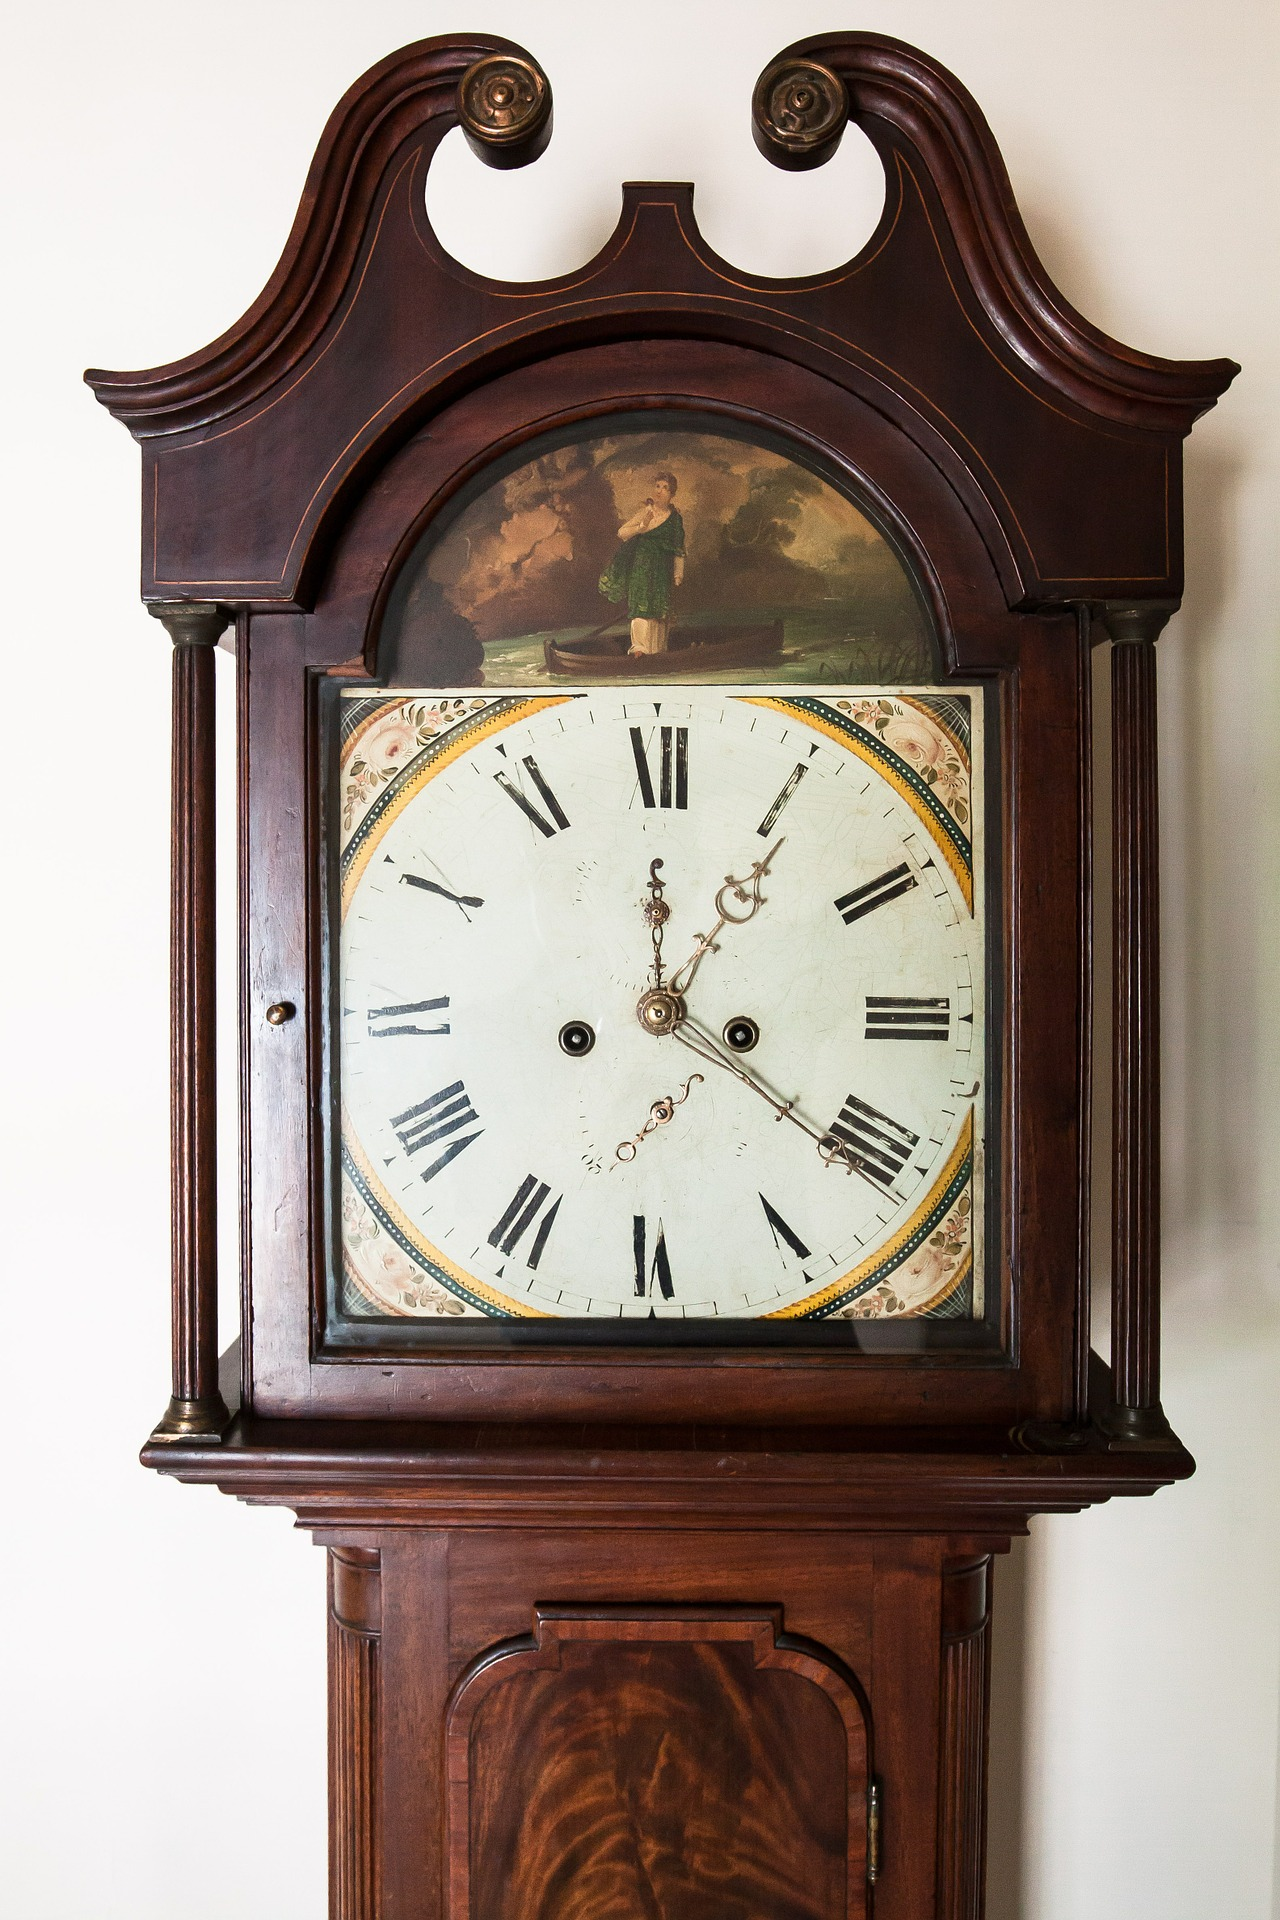 clock-419250_1920.jpg